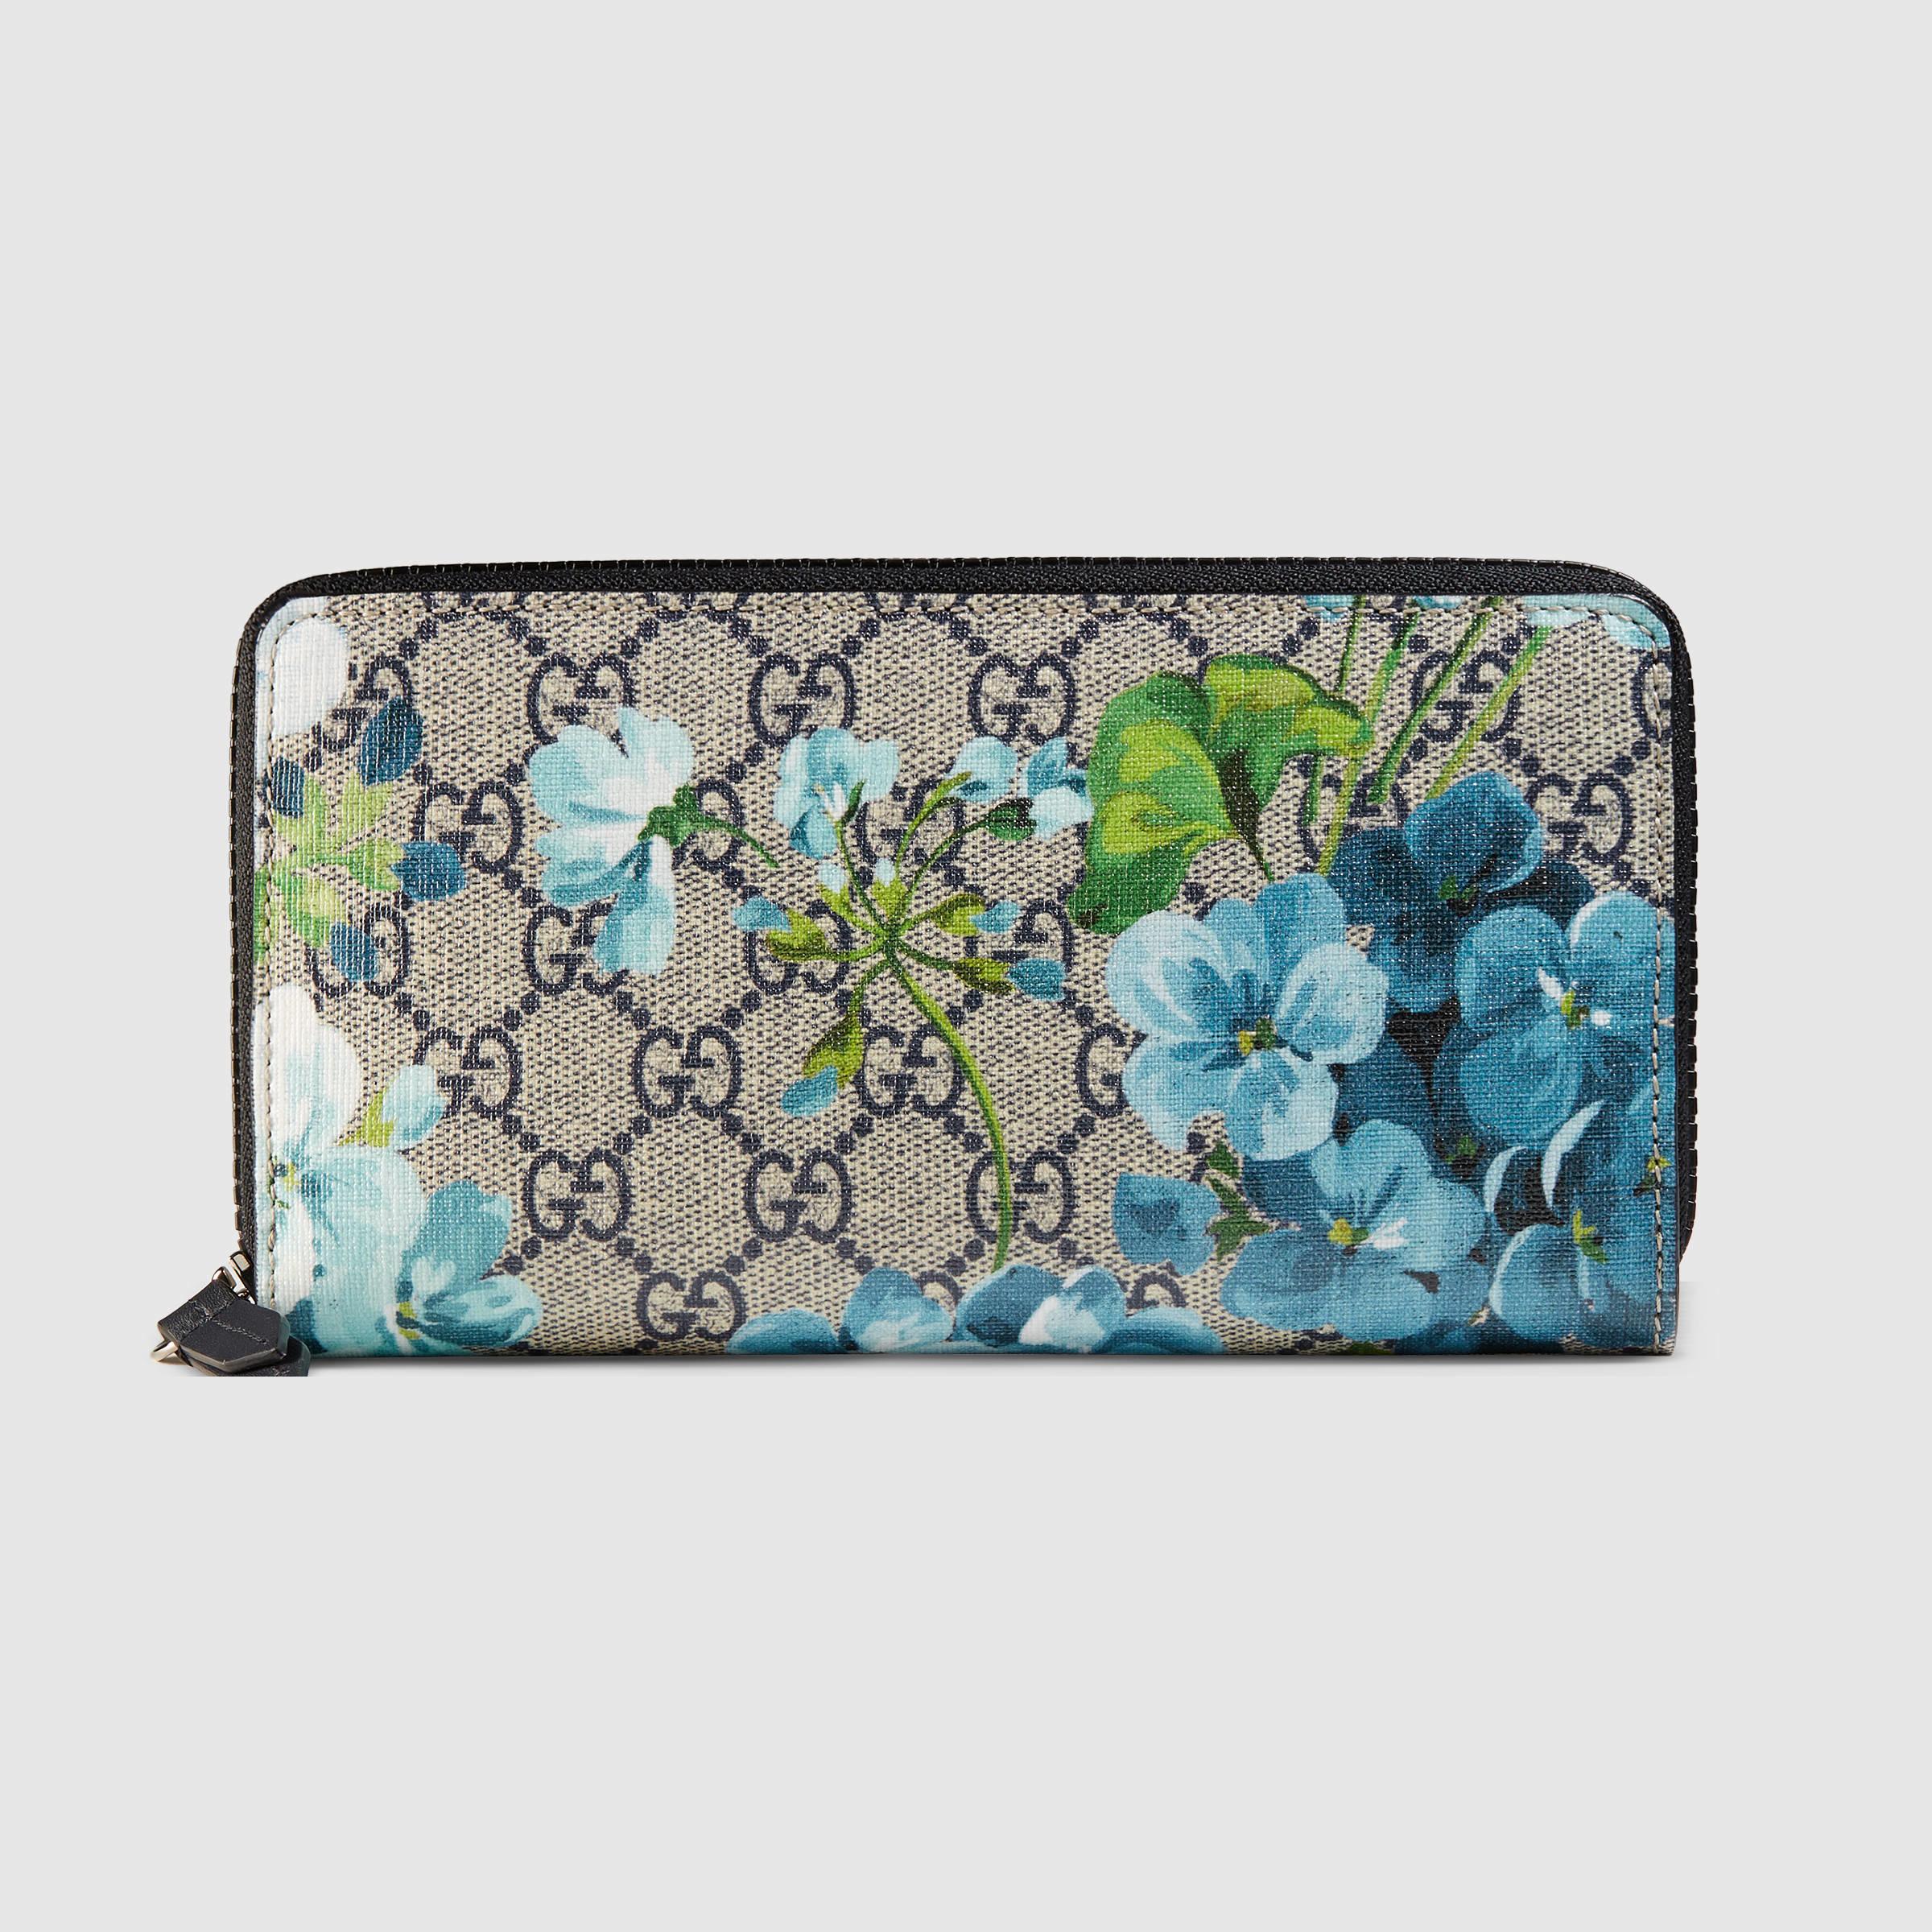 628c729fbf74 Gucci Gg Blooms Zip Around Wallet Green | Stanford Center for ...